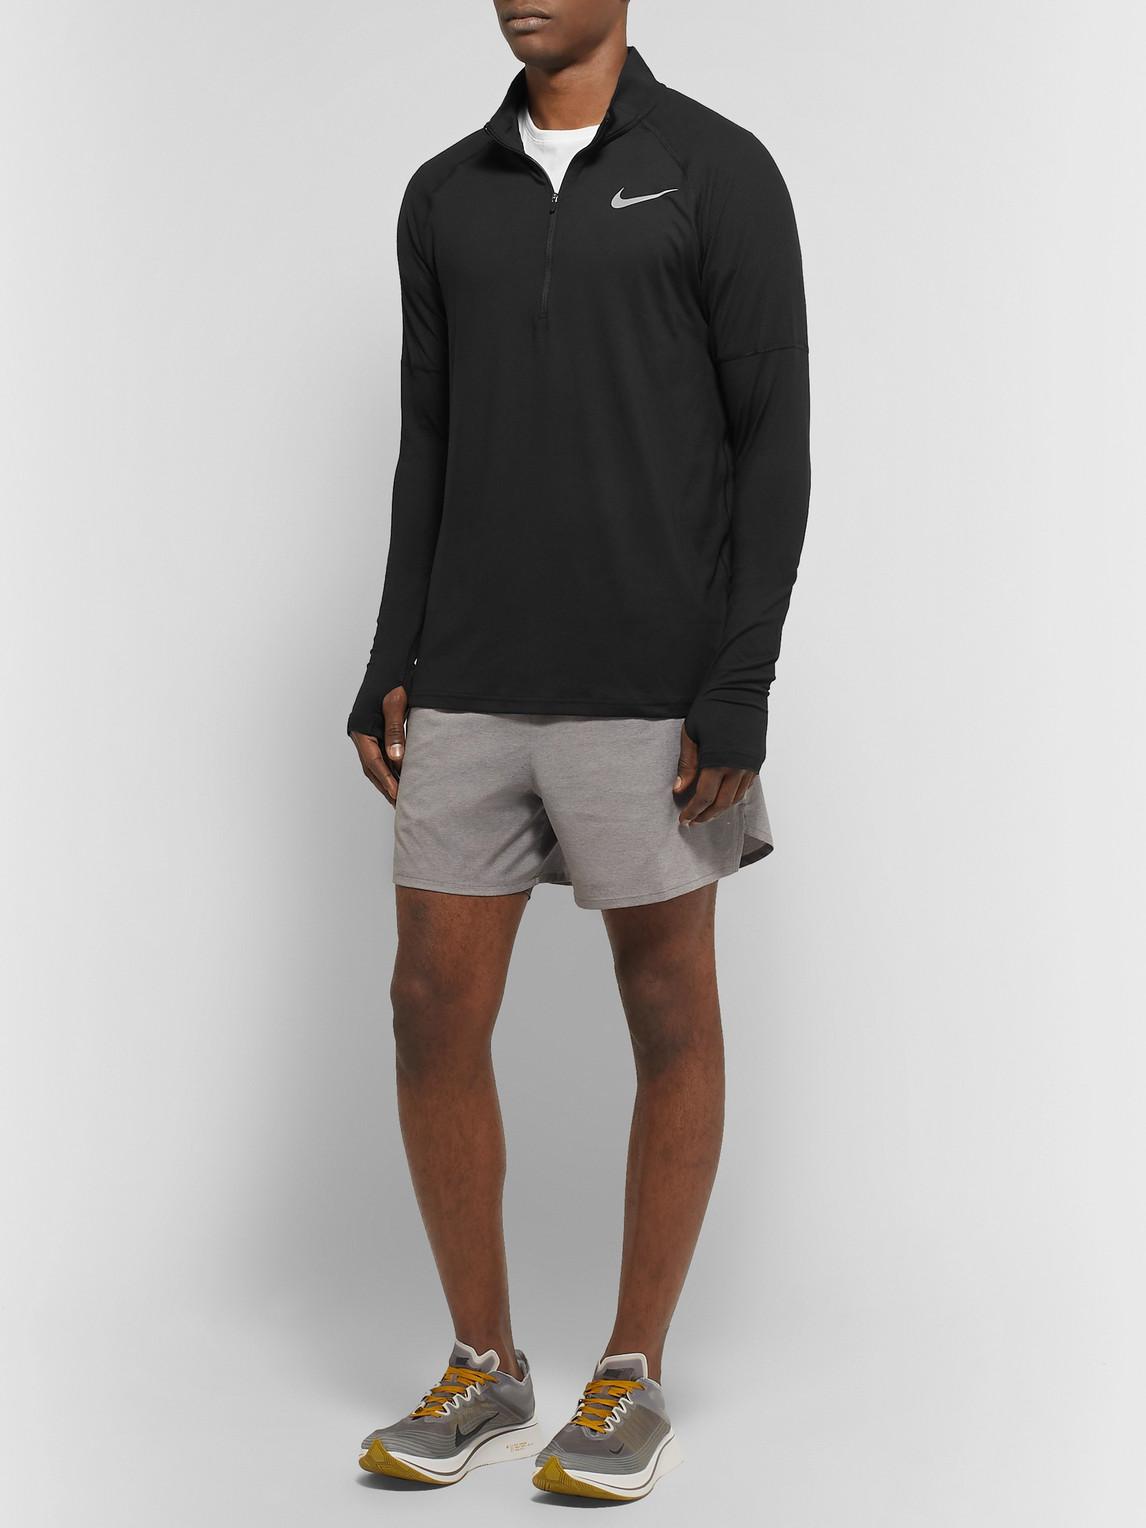 Nike Tops ELEMENT DRI